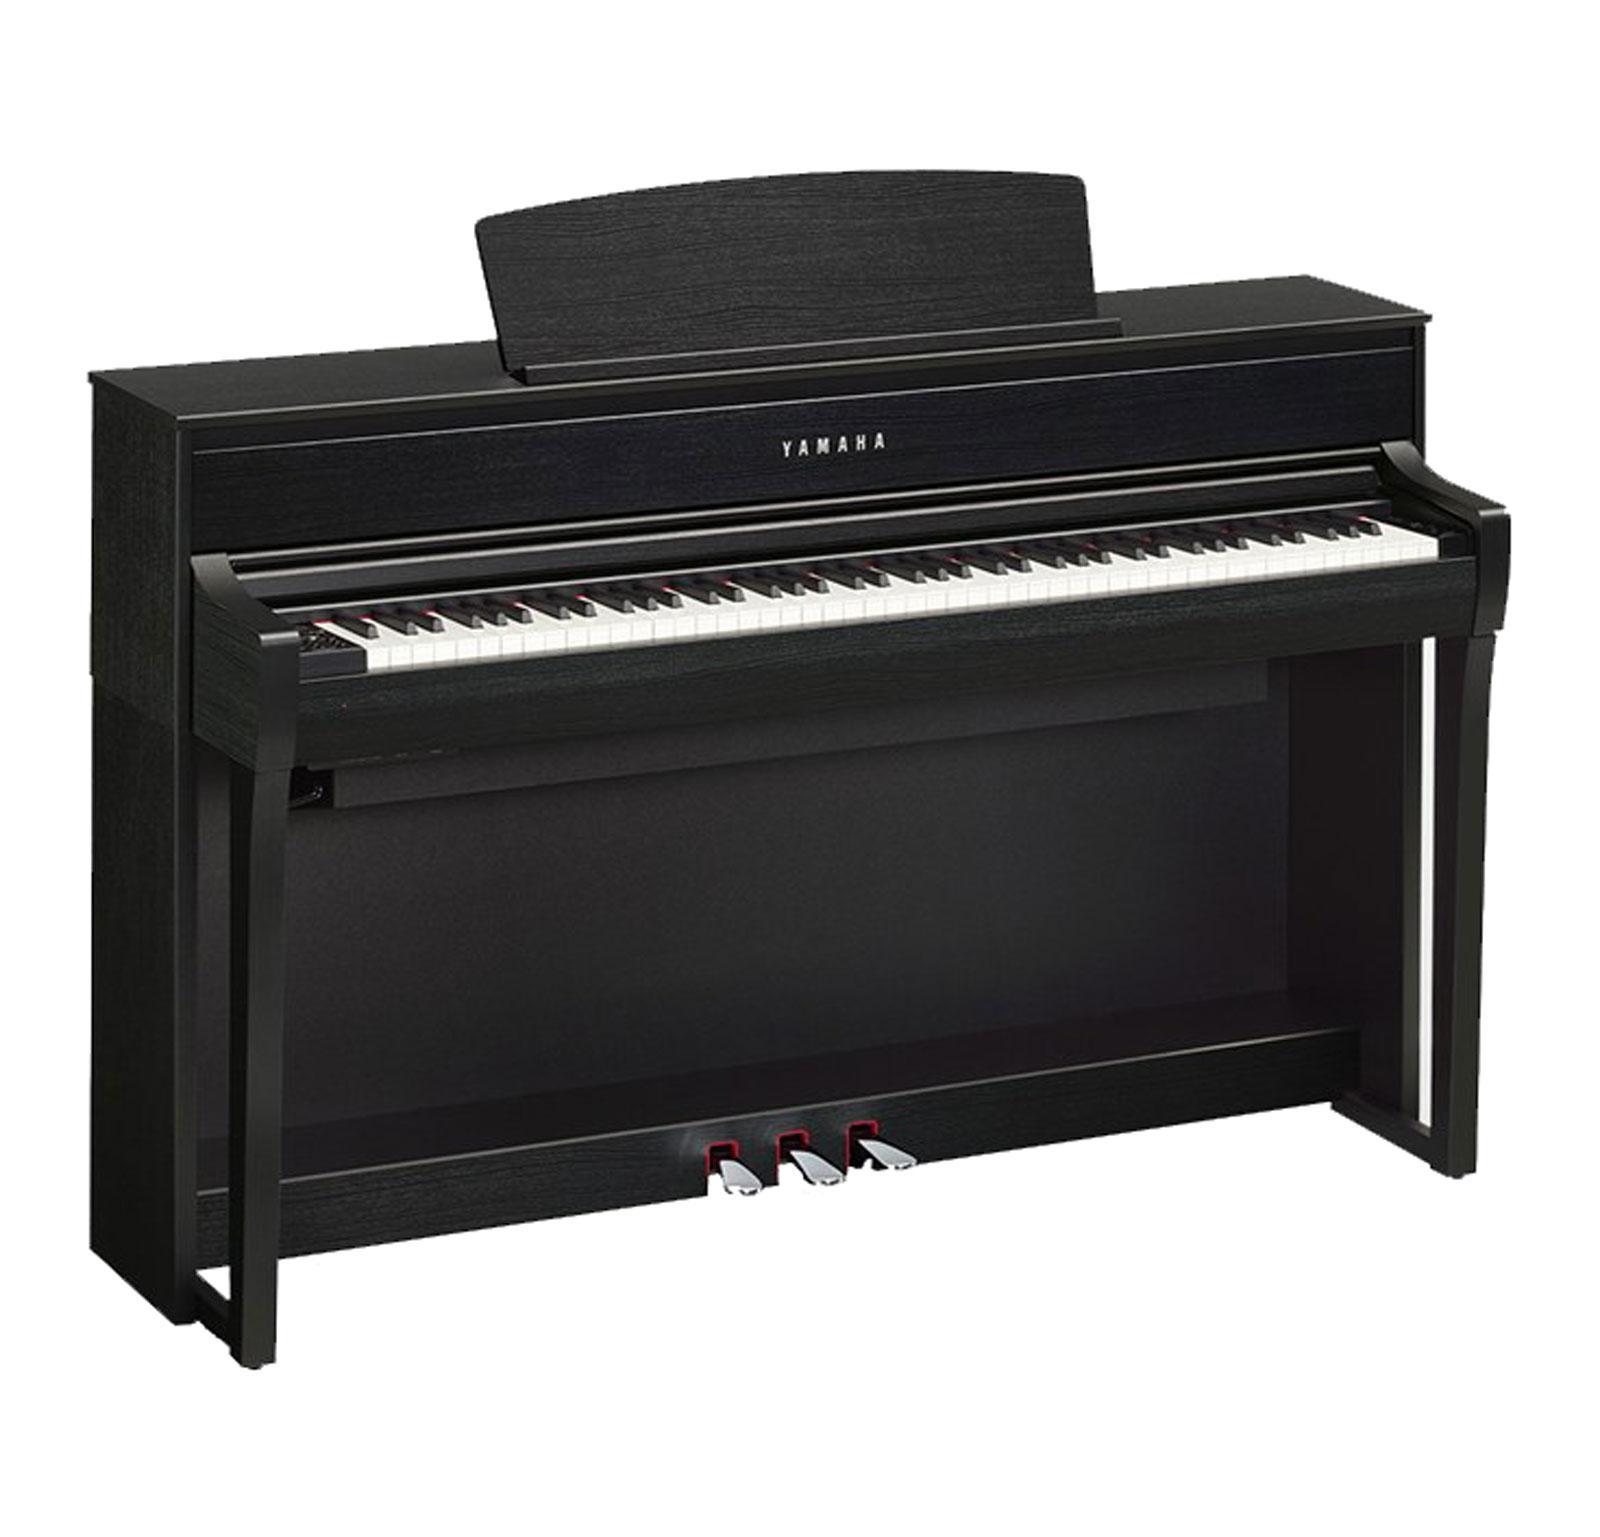 Yamaha CLP 675 B Digitalpiano schwarznuss